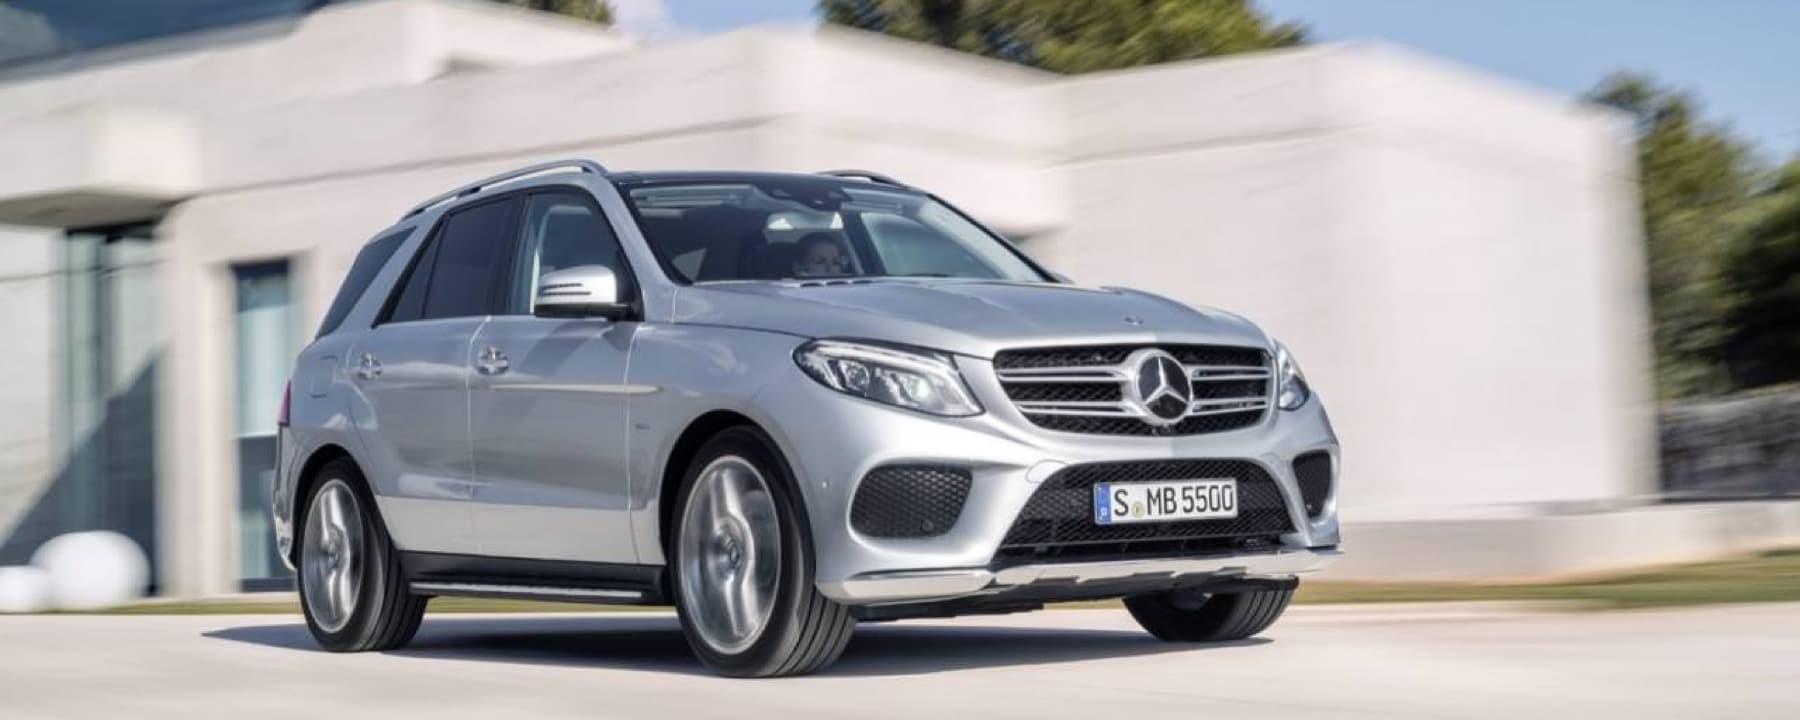 Mercedes benz usa introduces a new video mercedes benz for Mercedes benz usa pre owned